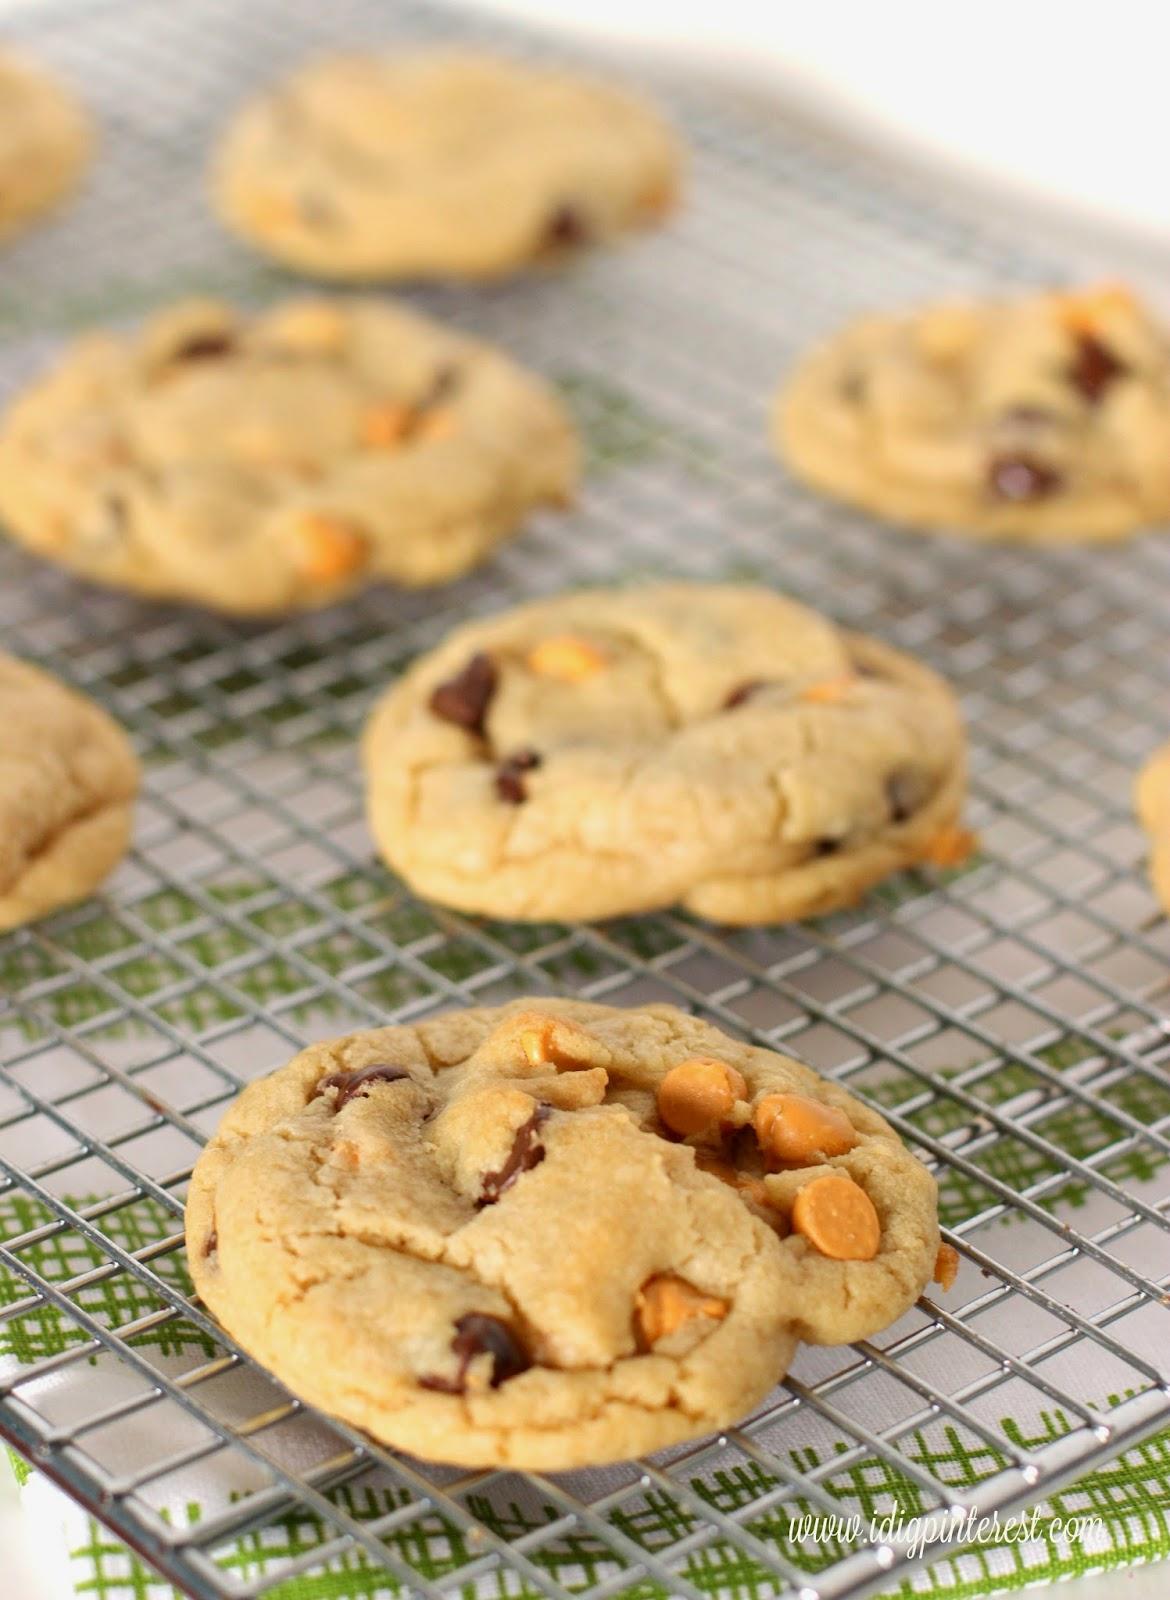 Chewy_Good_Butterscotch_Chip_Cookies.jpg